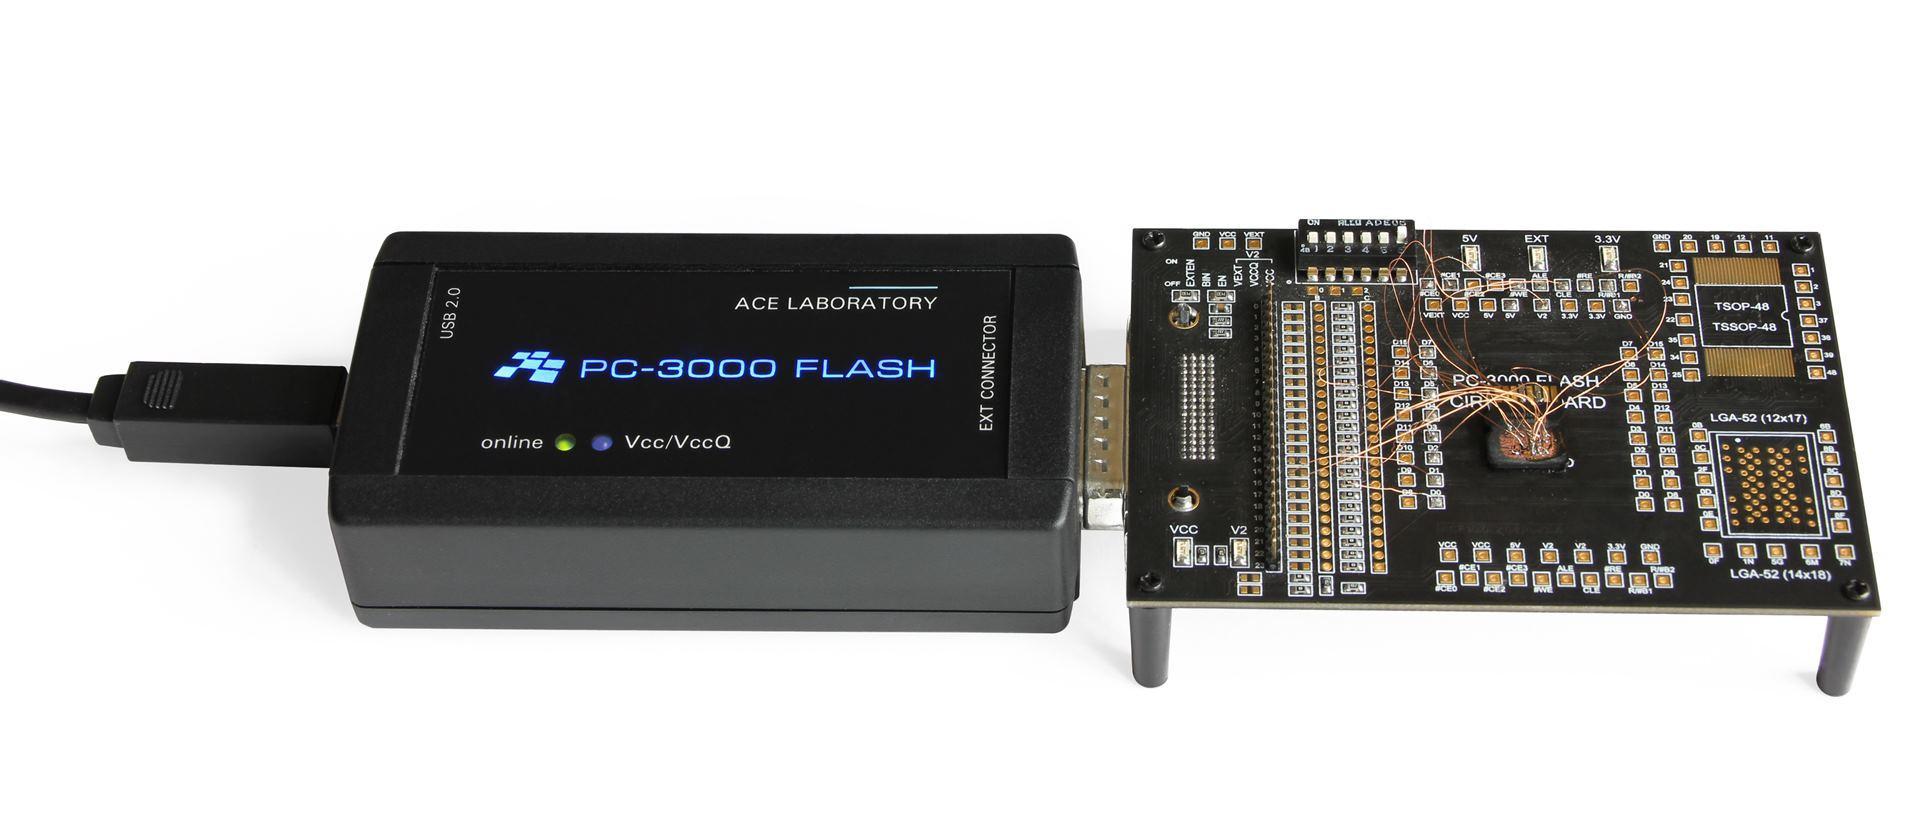 Recuperación de Datos de Memorias USB, SD, CF, MicroSD y SSD